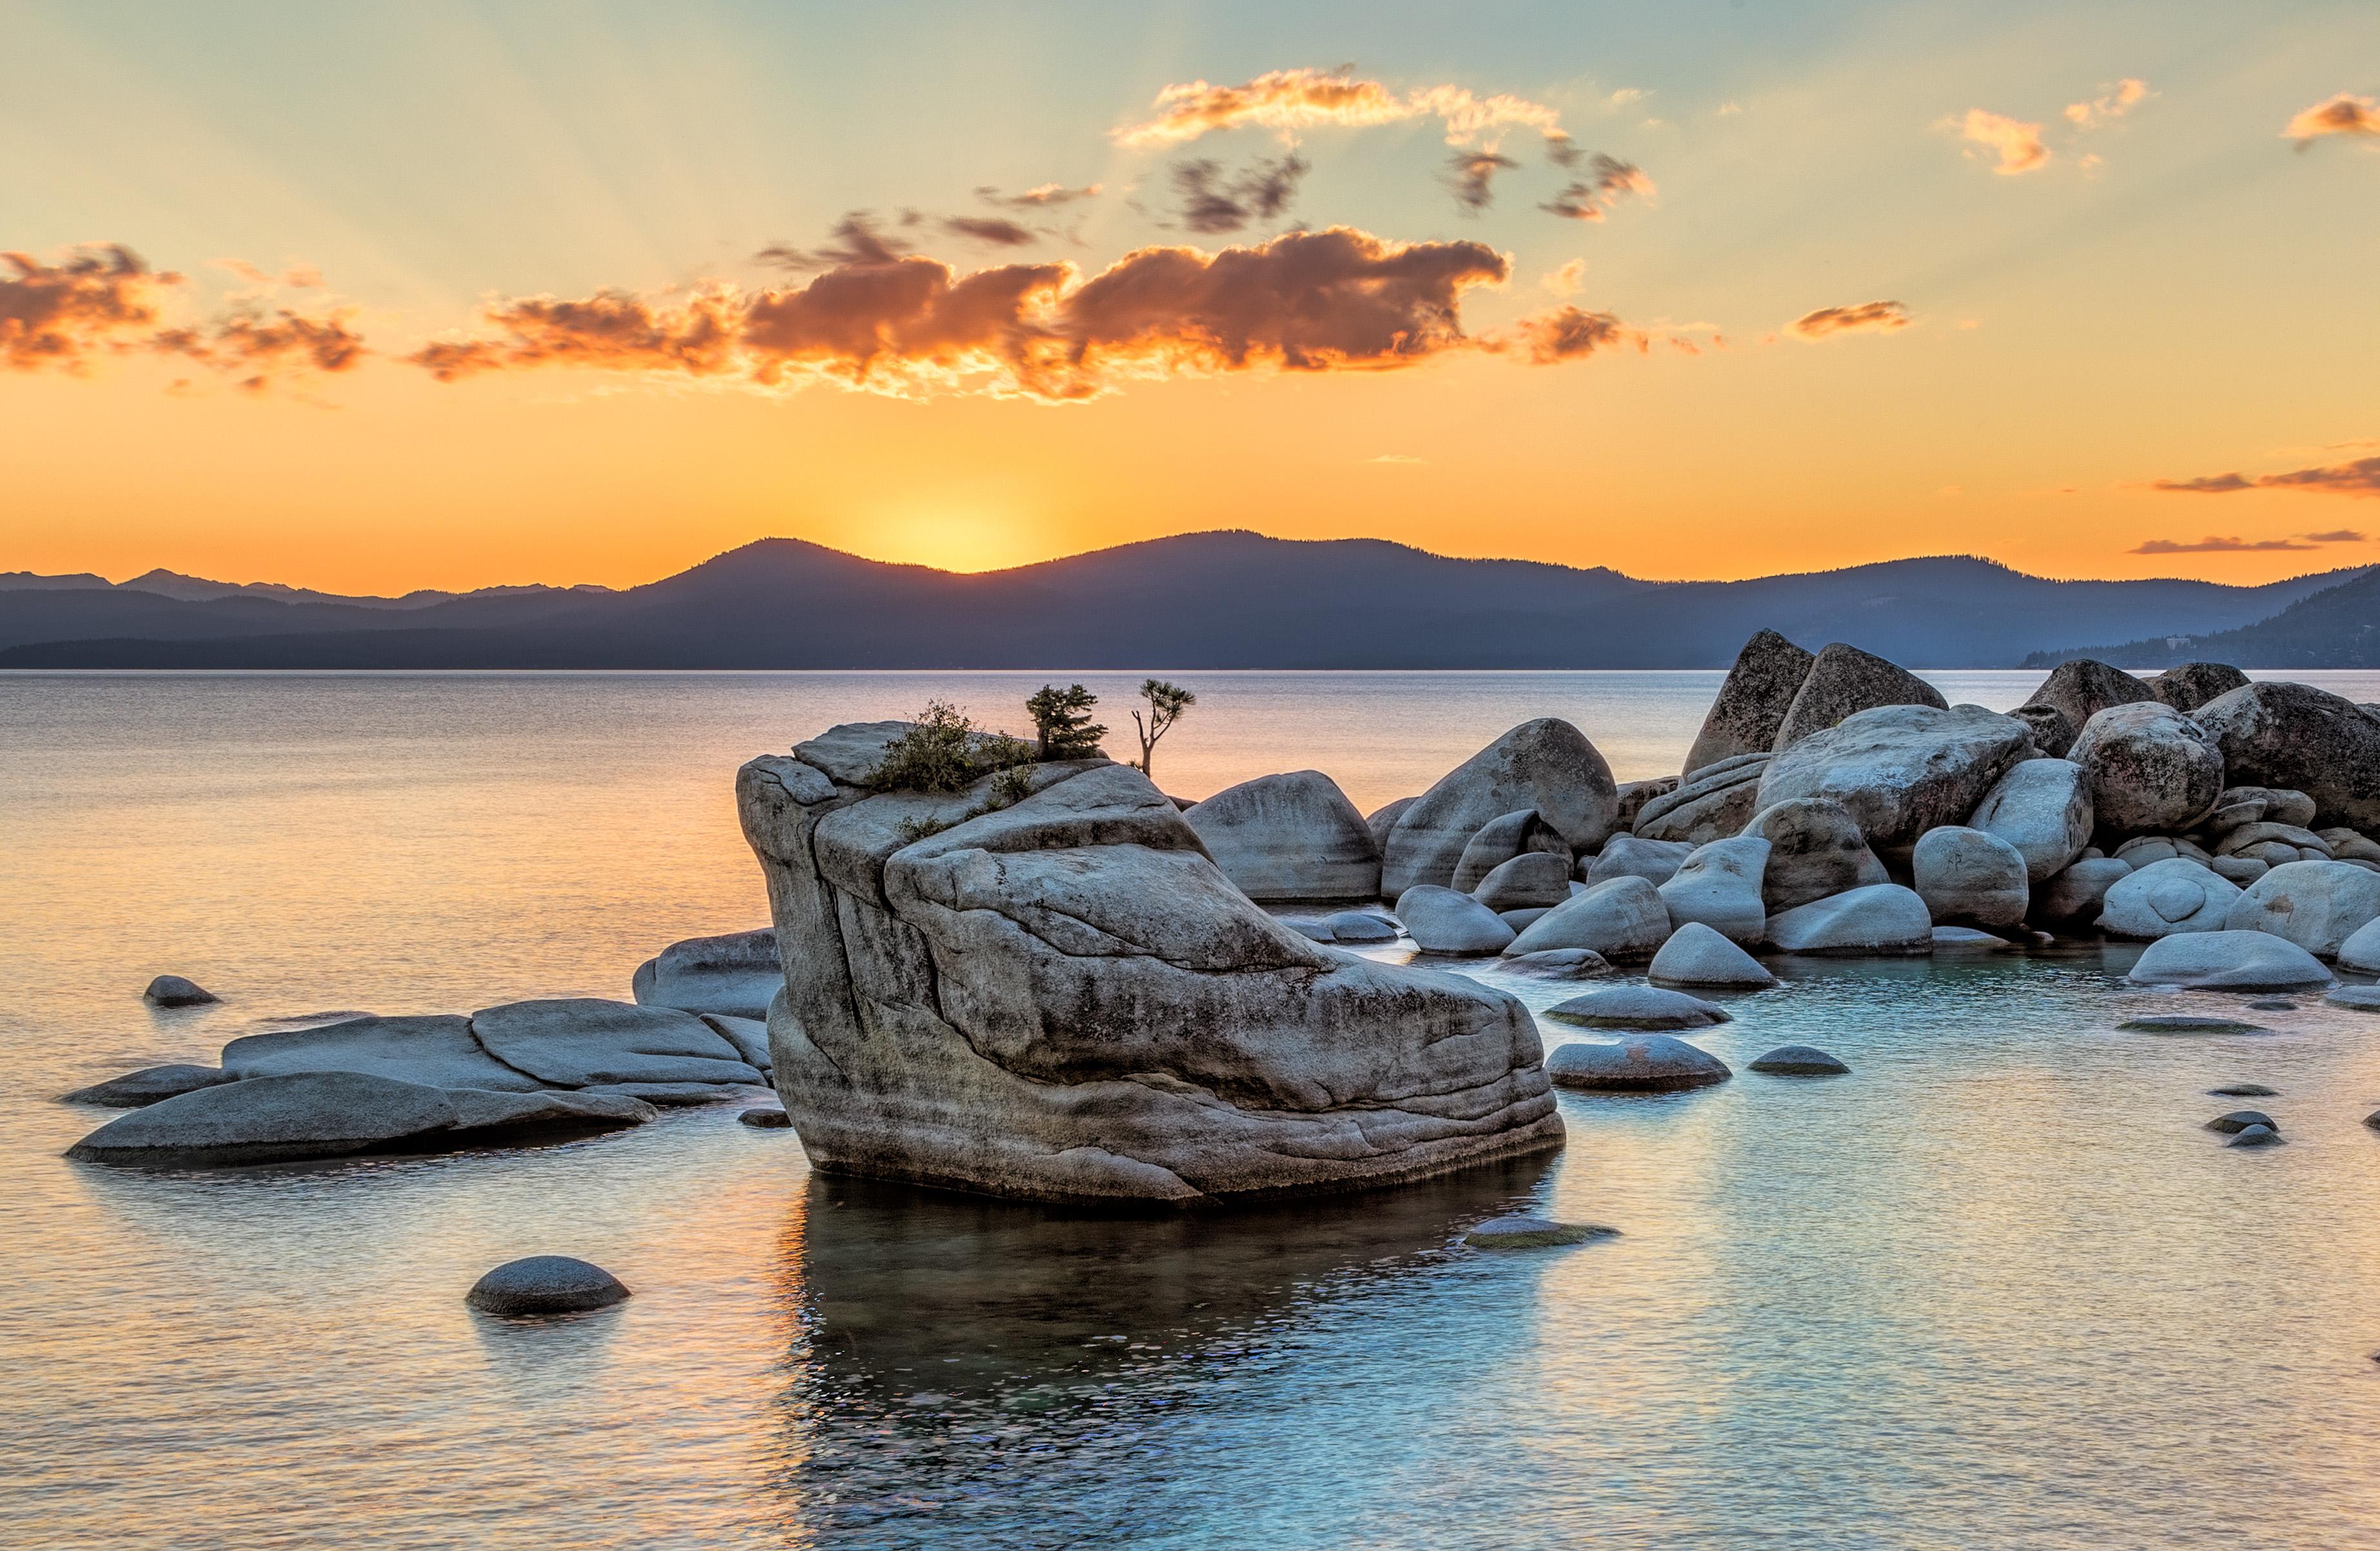 Bonzai Sunset